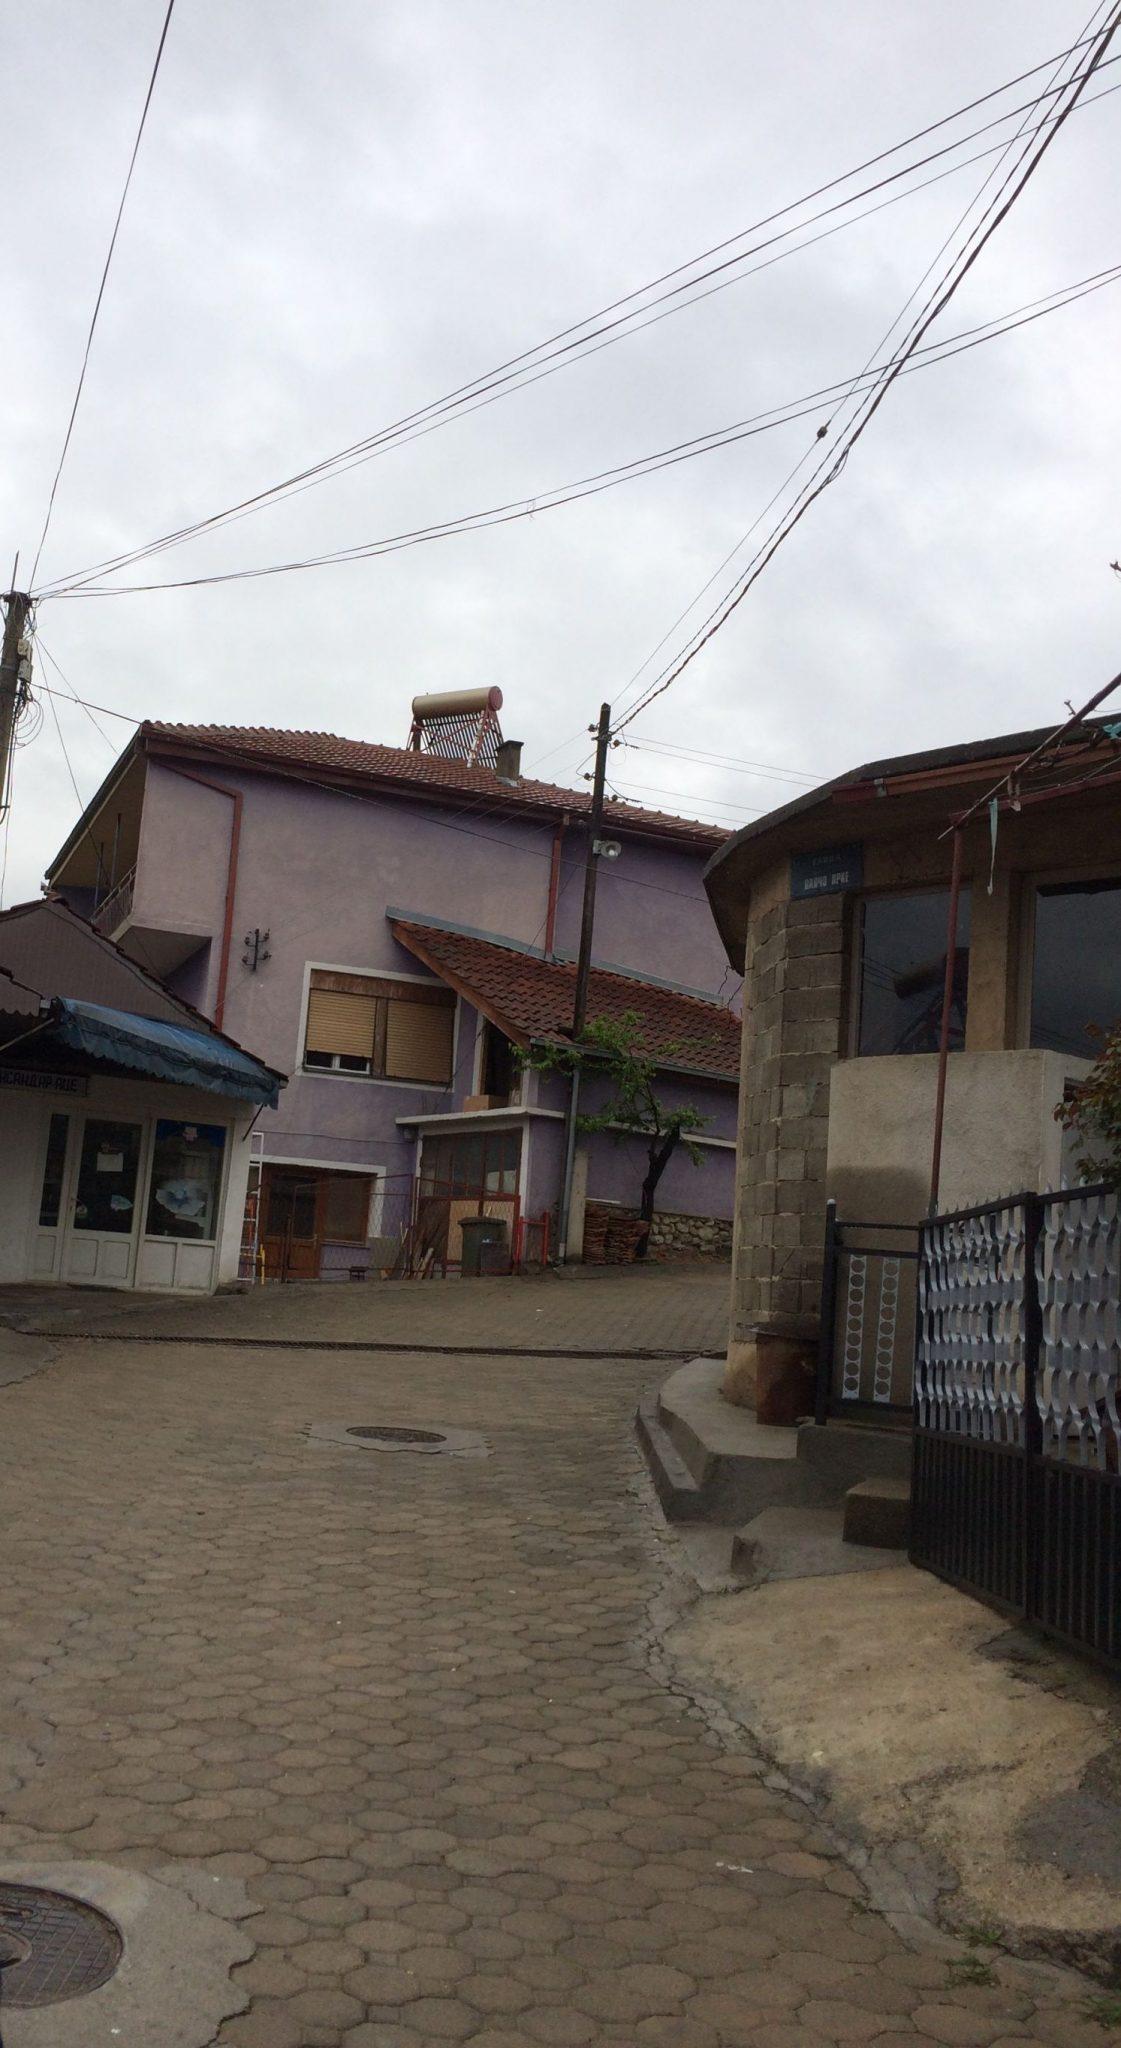 Delčevo: 1 amazing rural village to visit in North Macedonia